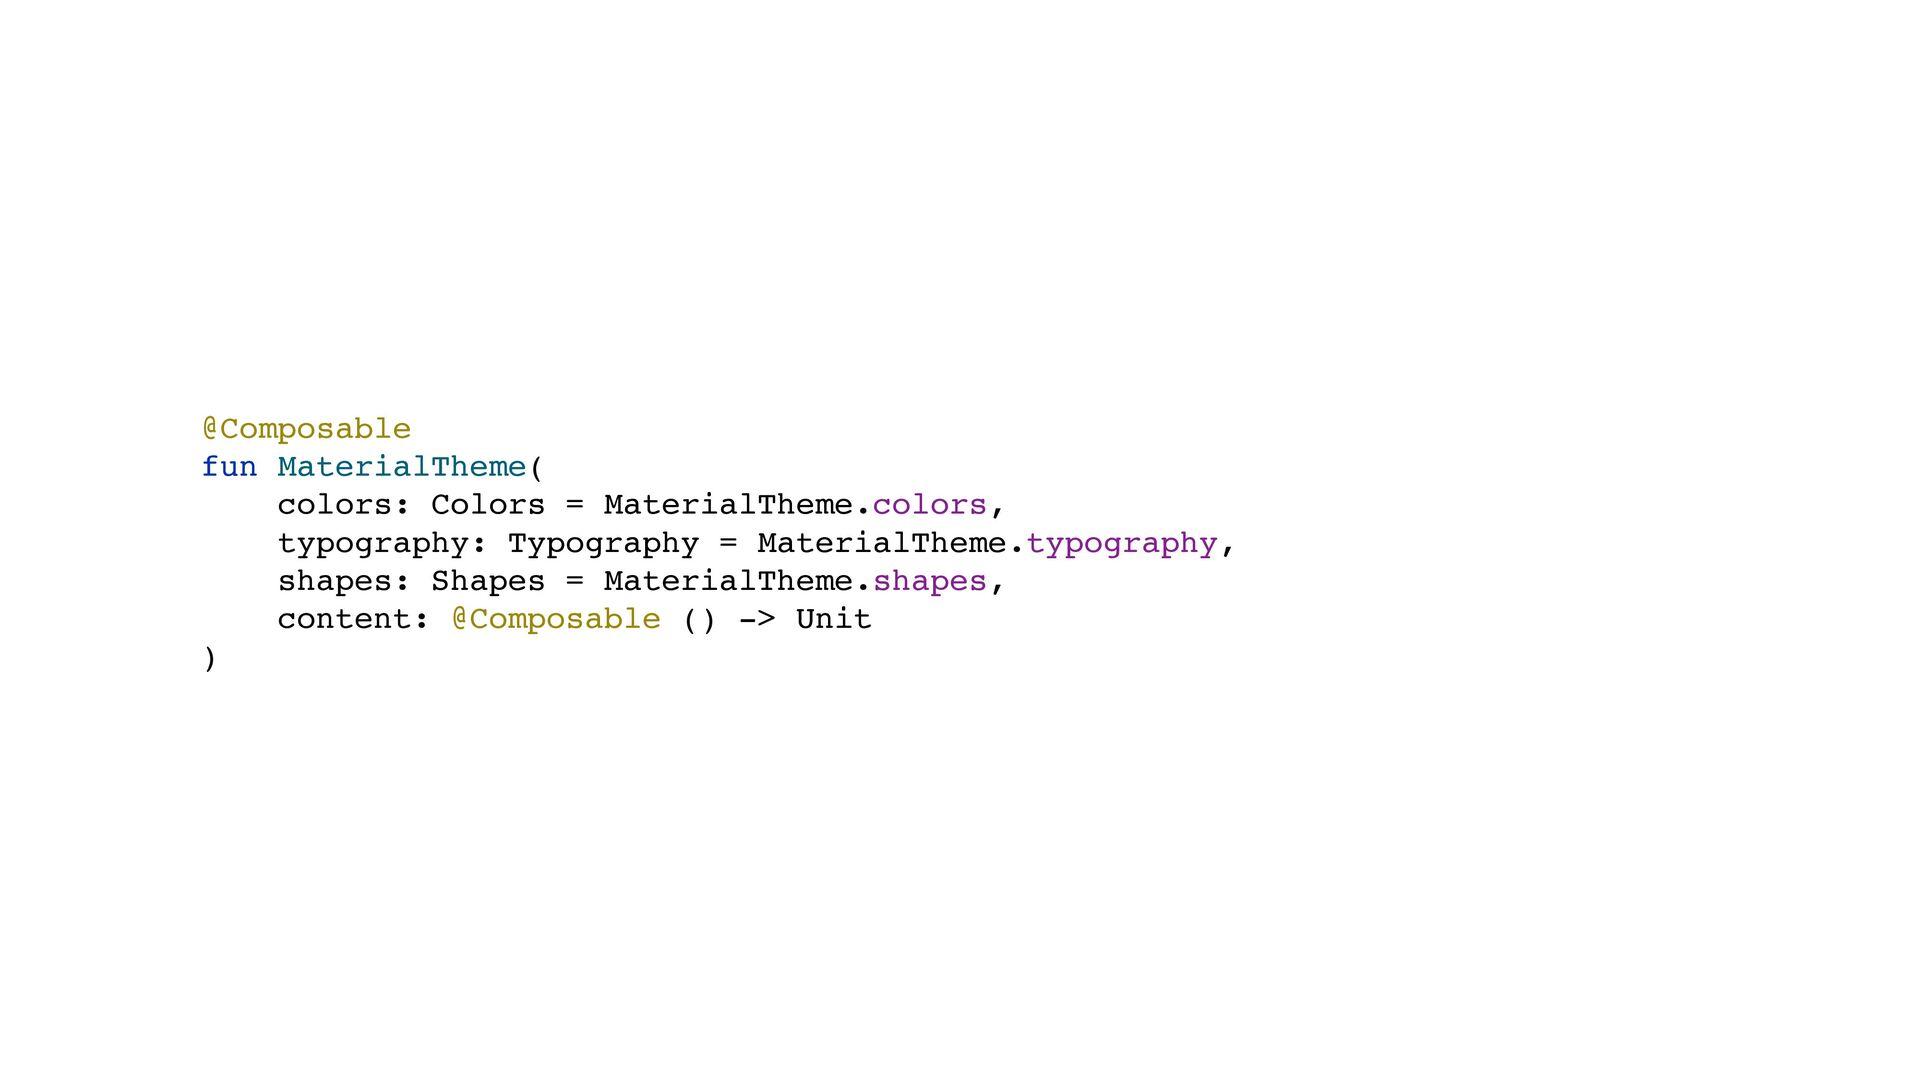 @Composable fun MaterialTheme( colors: Colors =...